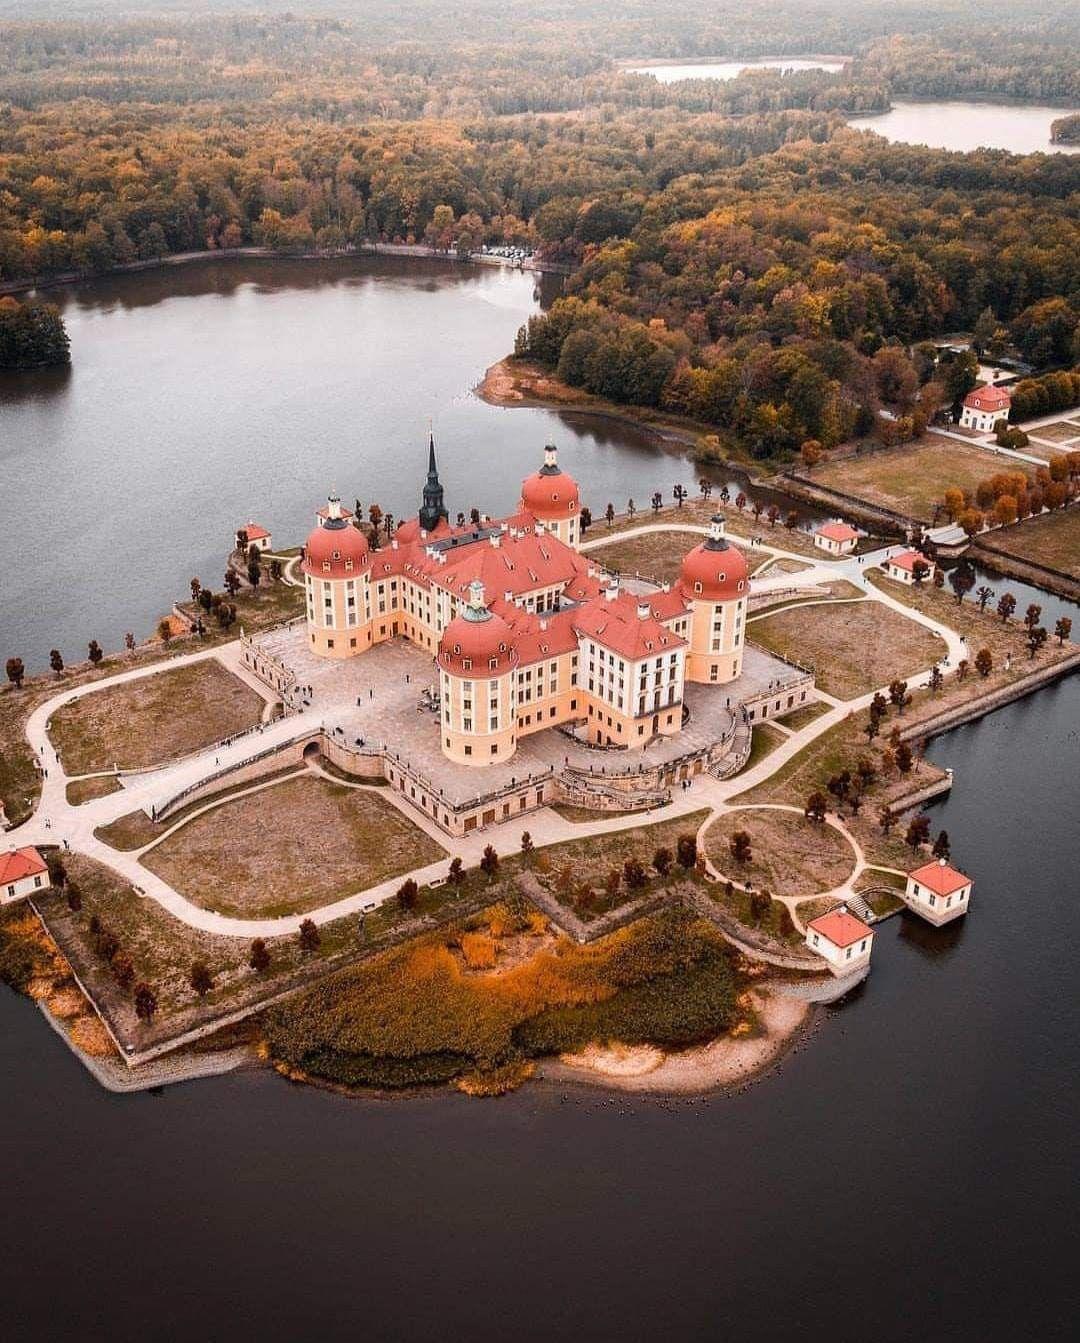 Moritzburg (Sachsen) - Castle / Schloss / Château #dreammansion